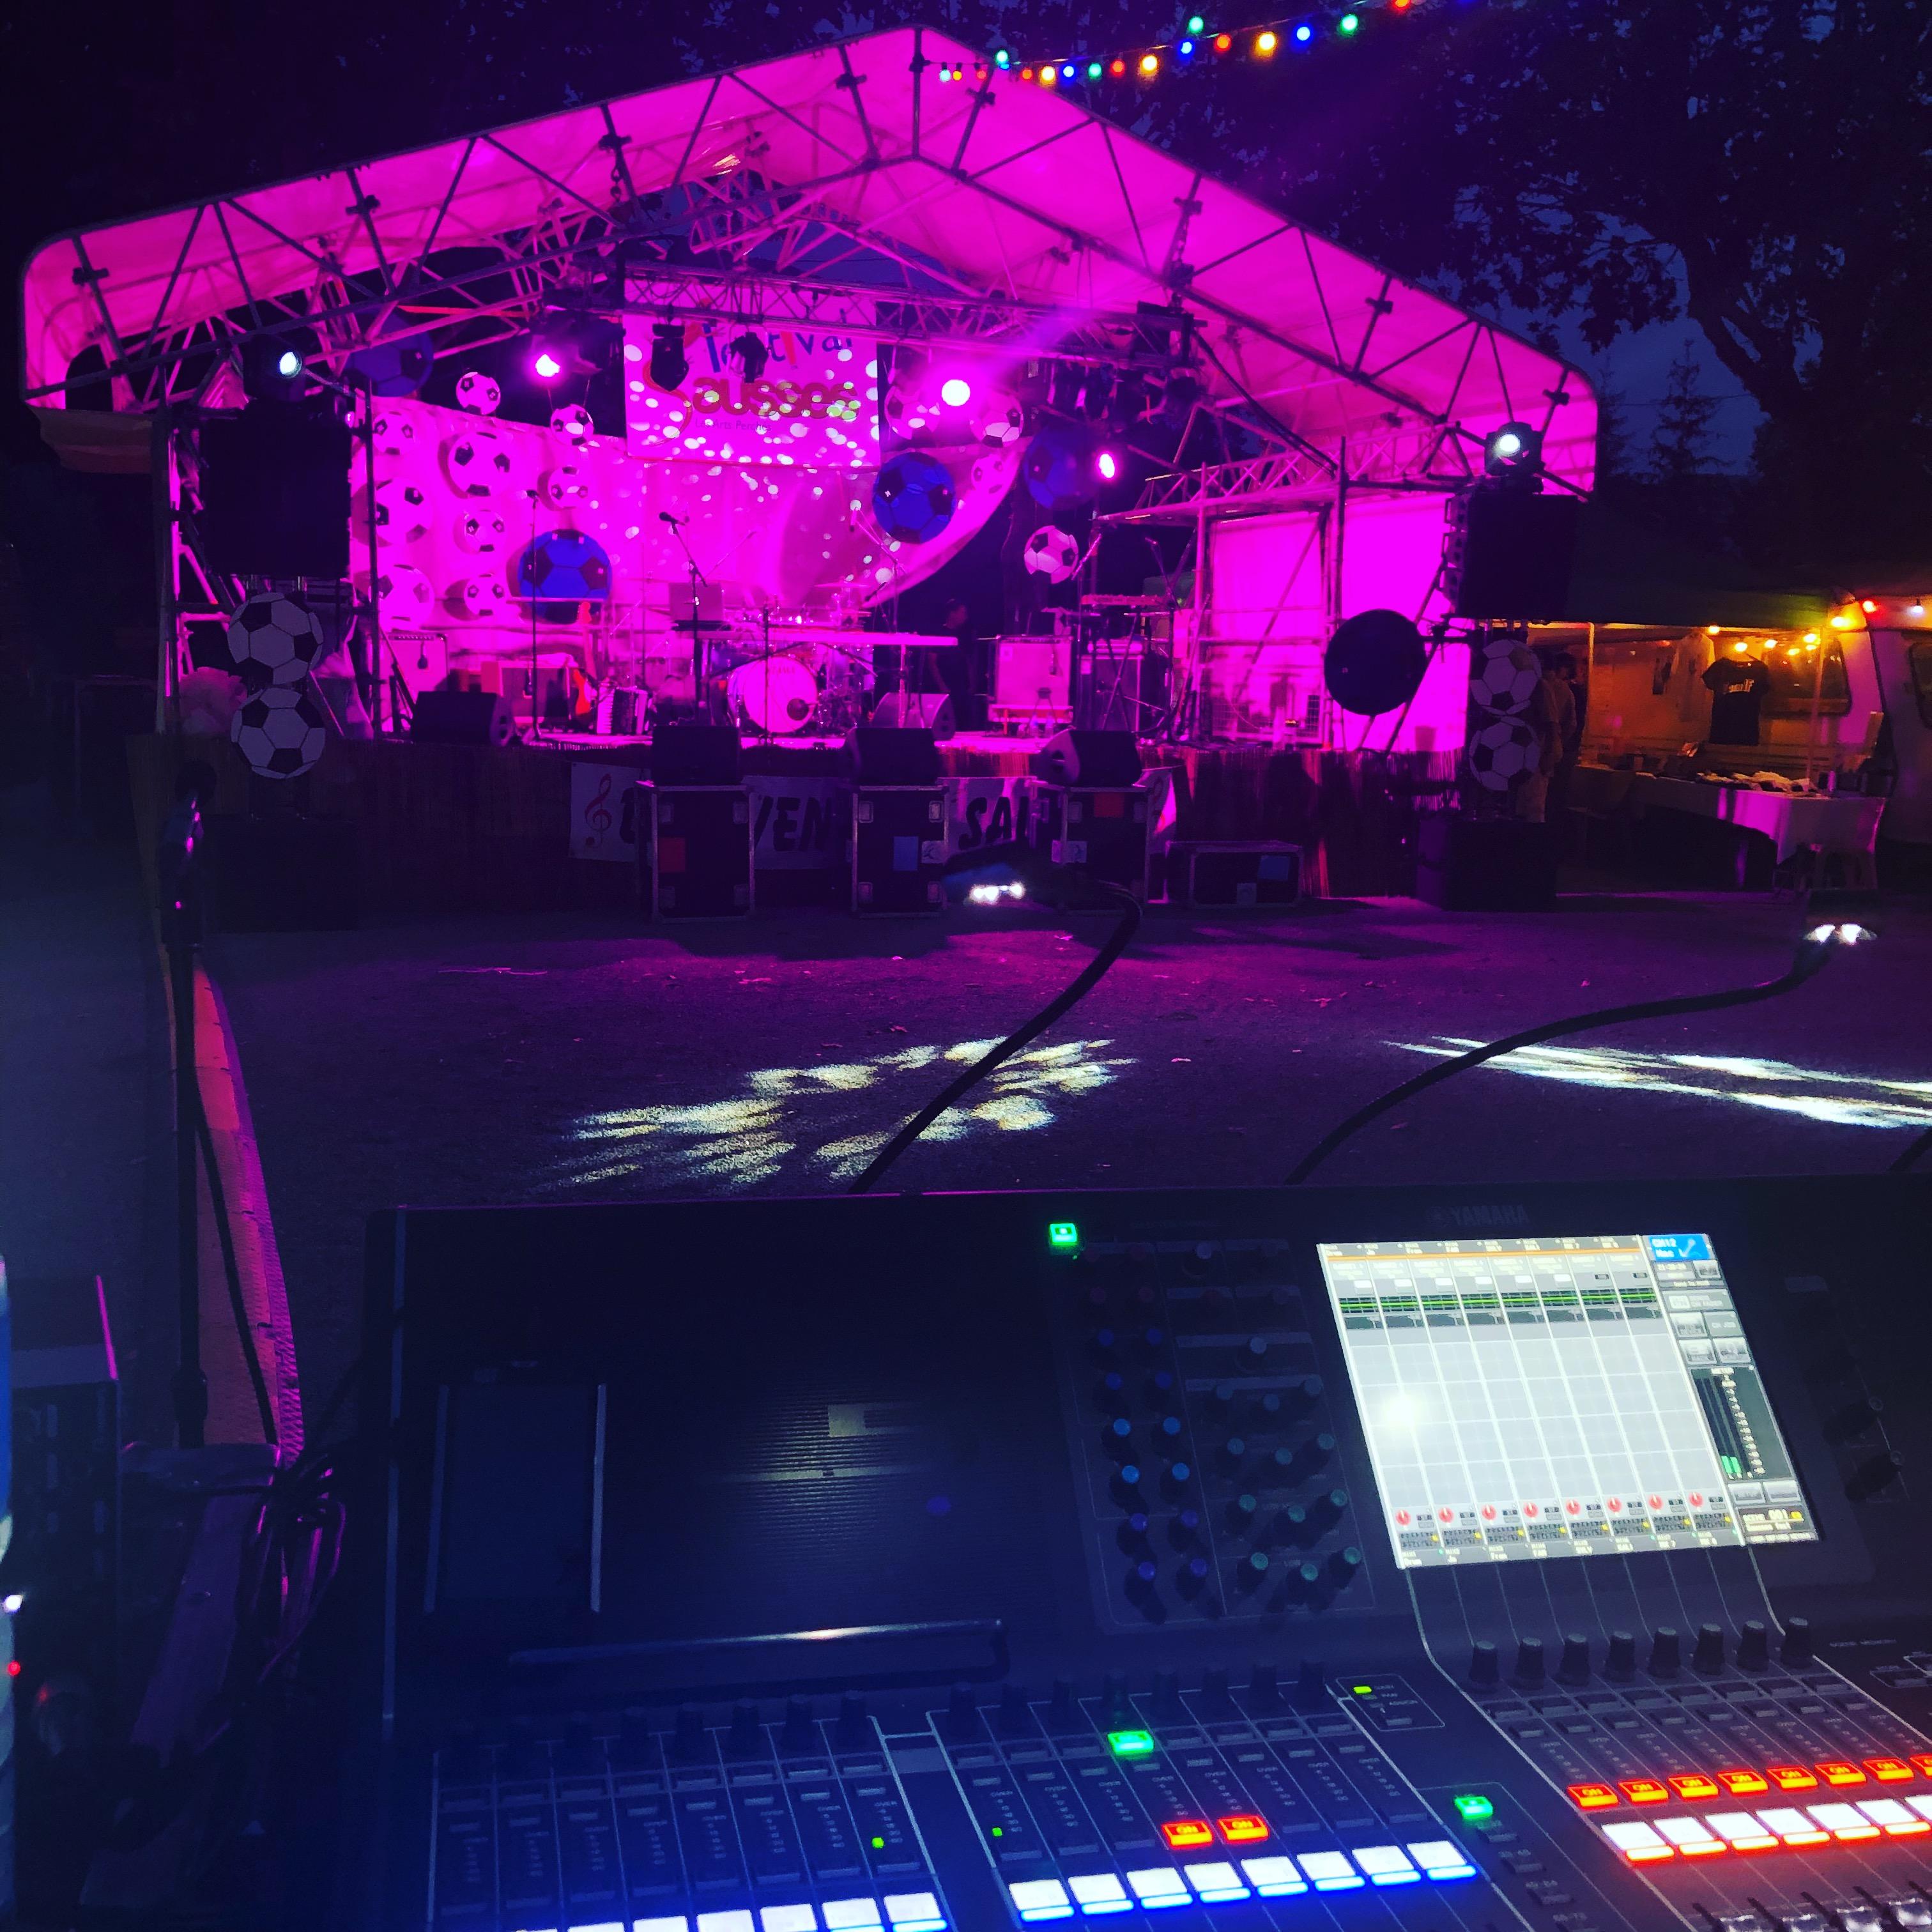 aucop-event-festival-festival en sausses-sonorisation-eclairage-cali-kolinka-dahan-scene-audiovisuel-evenementiel-alpes de haute provence-carros-nice-console-yamaha-oxo-projecteurs